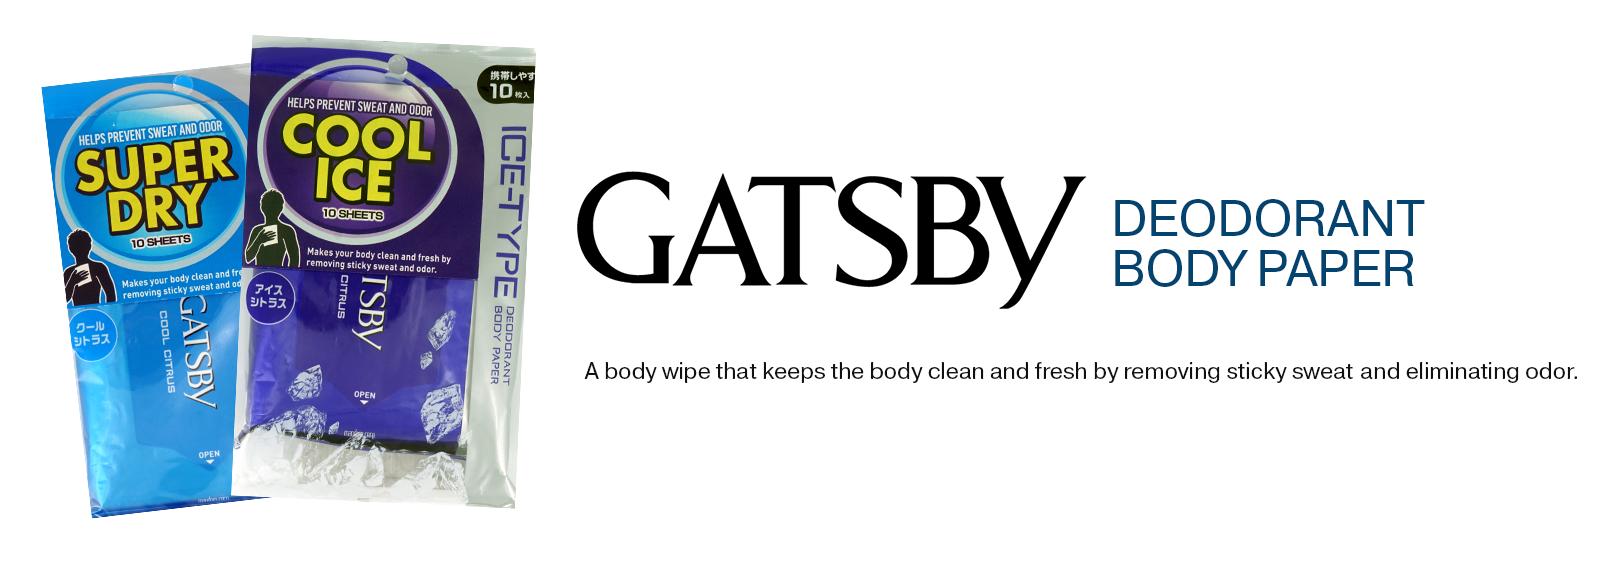 GATSBY Deodorant Body Paper Banner